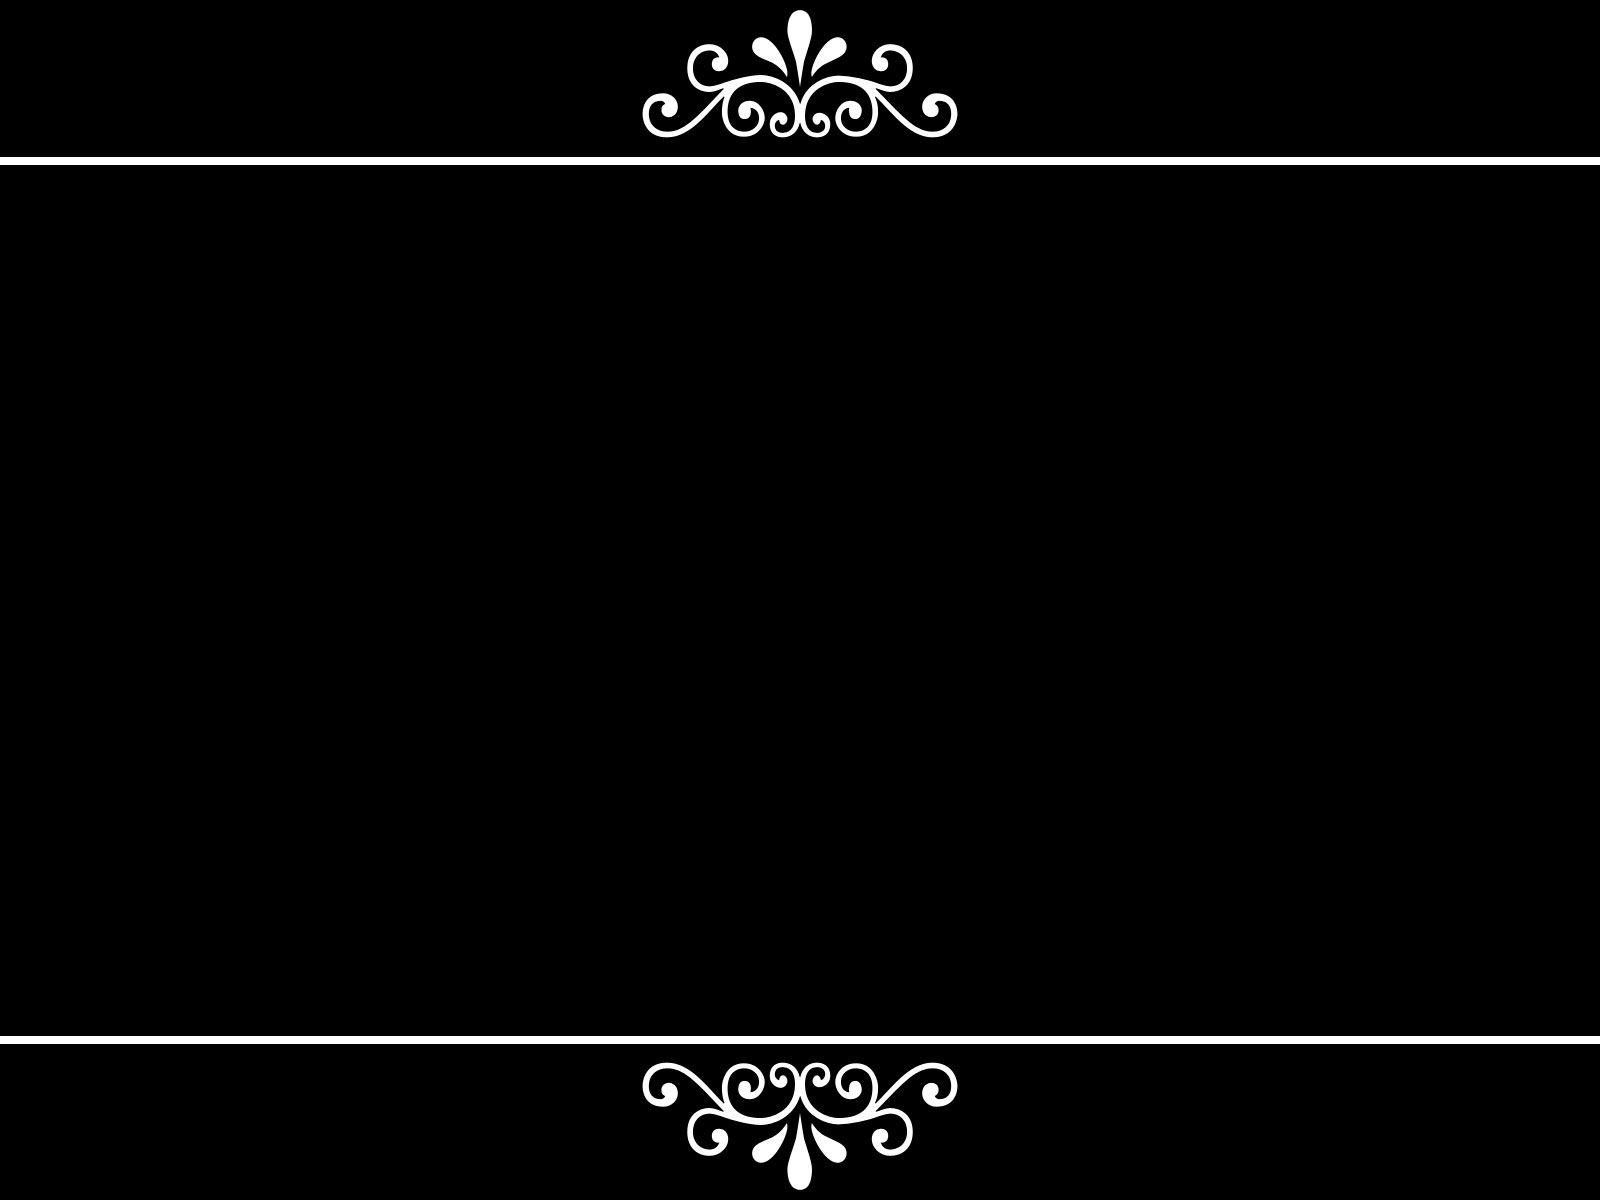 Ornament Black Background